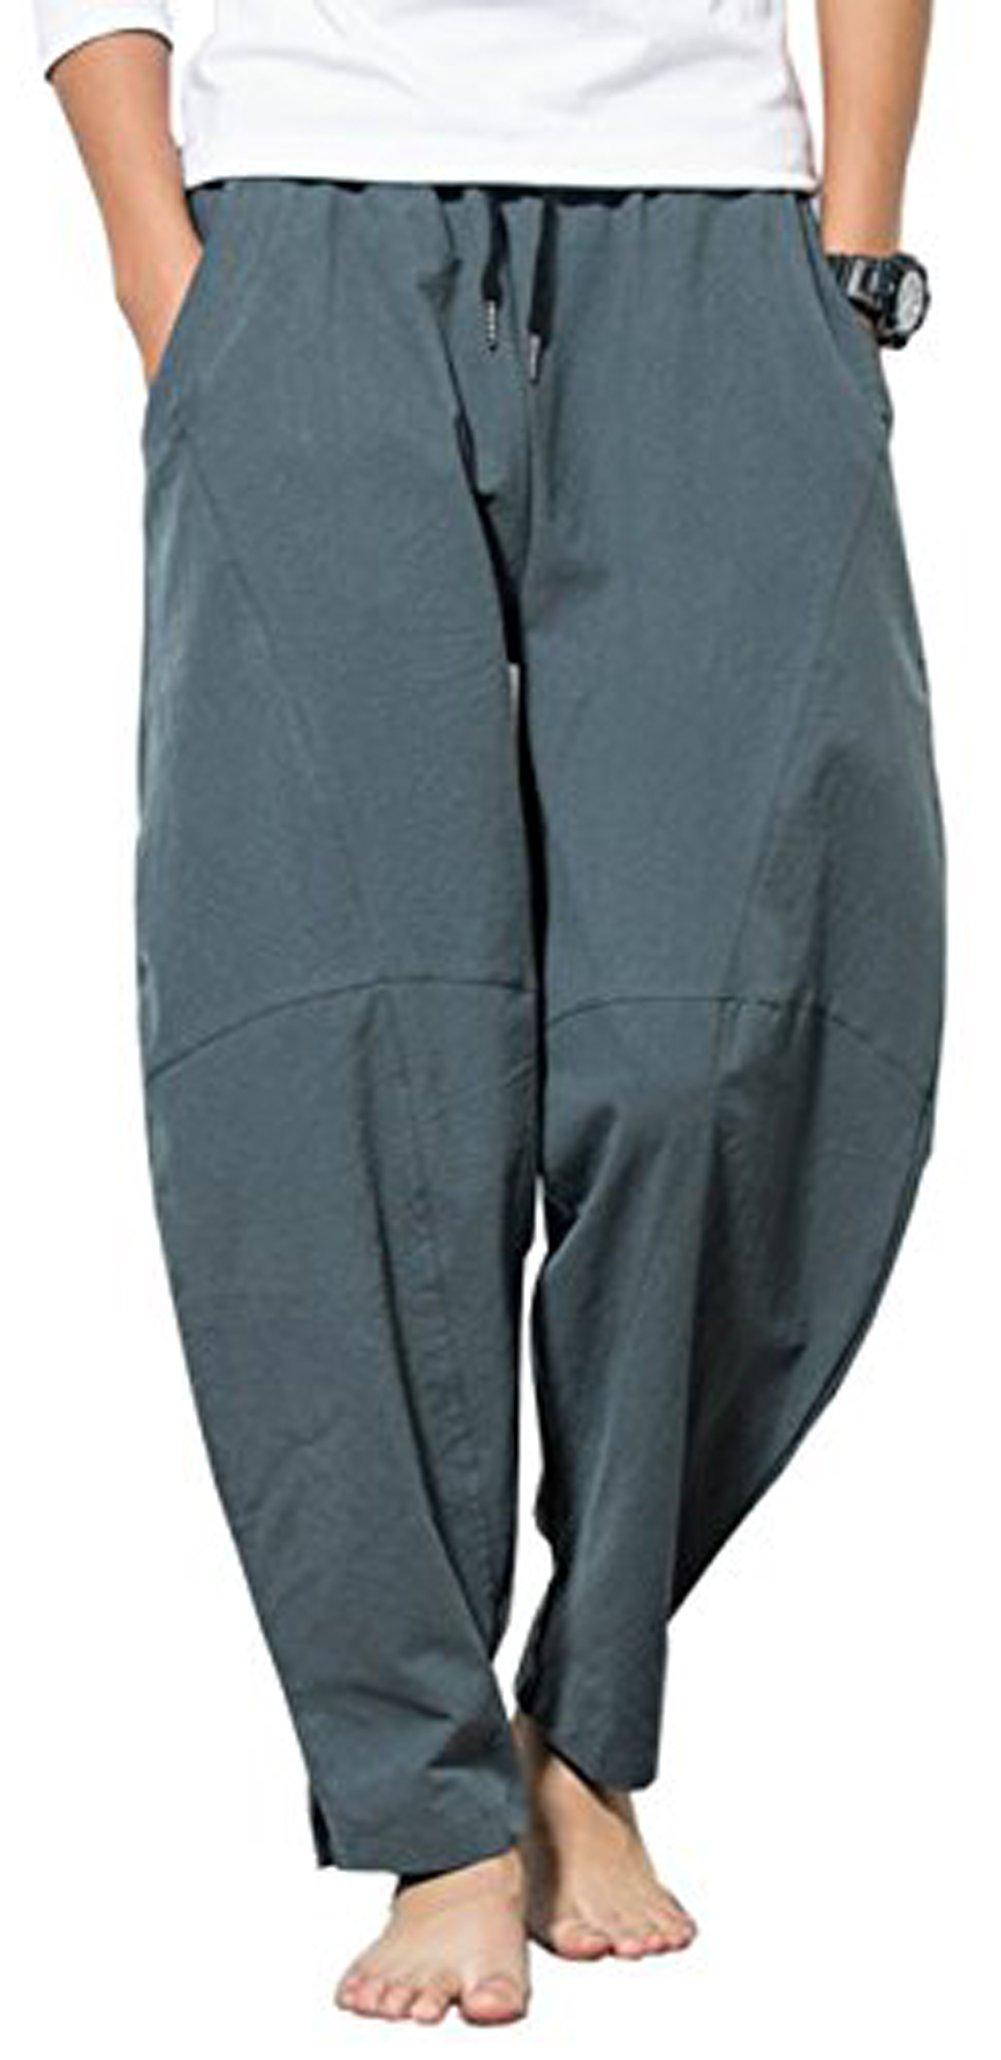 MLDYGYC Men's Summer Casual Cotton Baggy Drawstring Beach Trousers Harem Pants (Waist:39''-40'' US XL = Asian 5XL, Grey Blue)